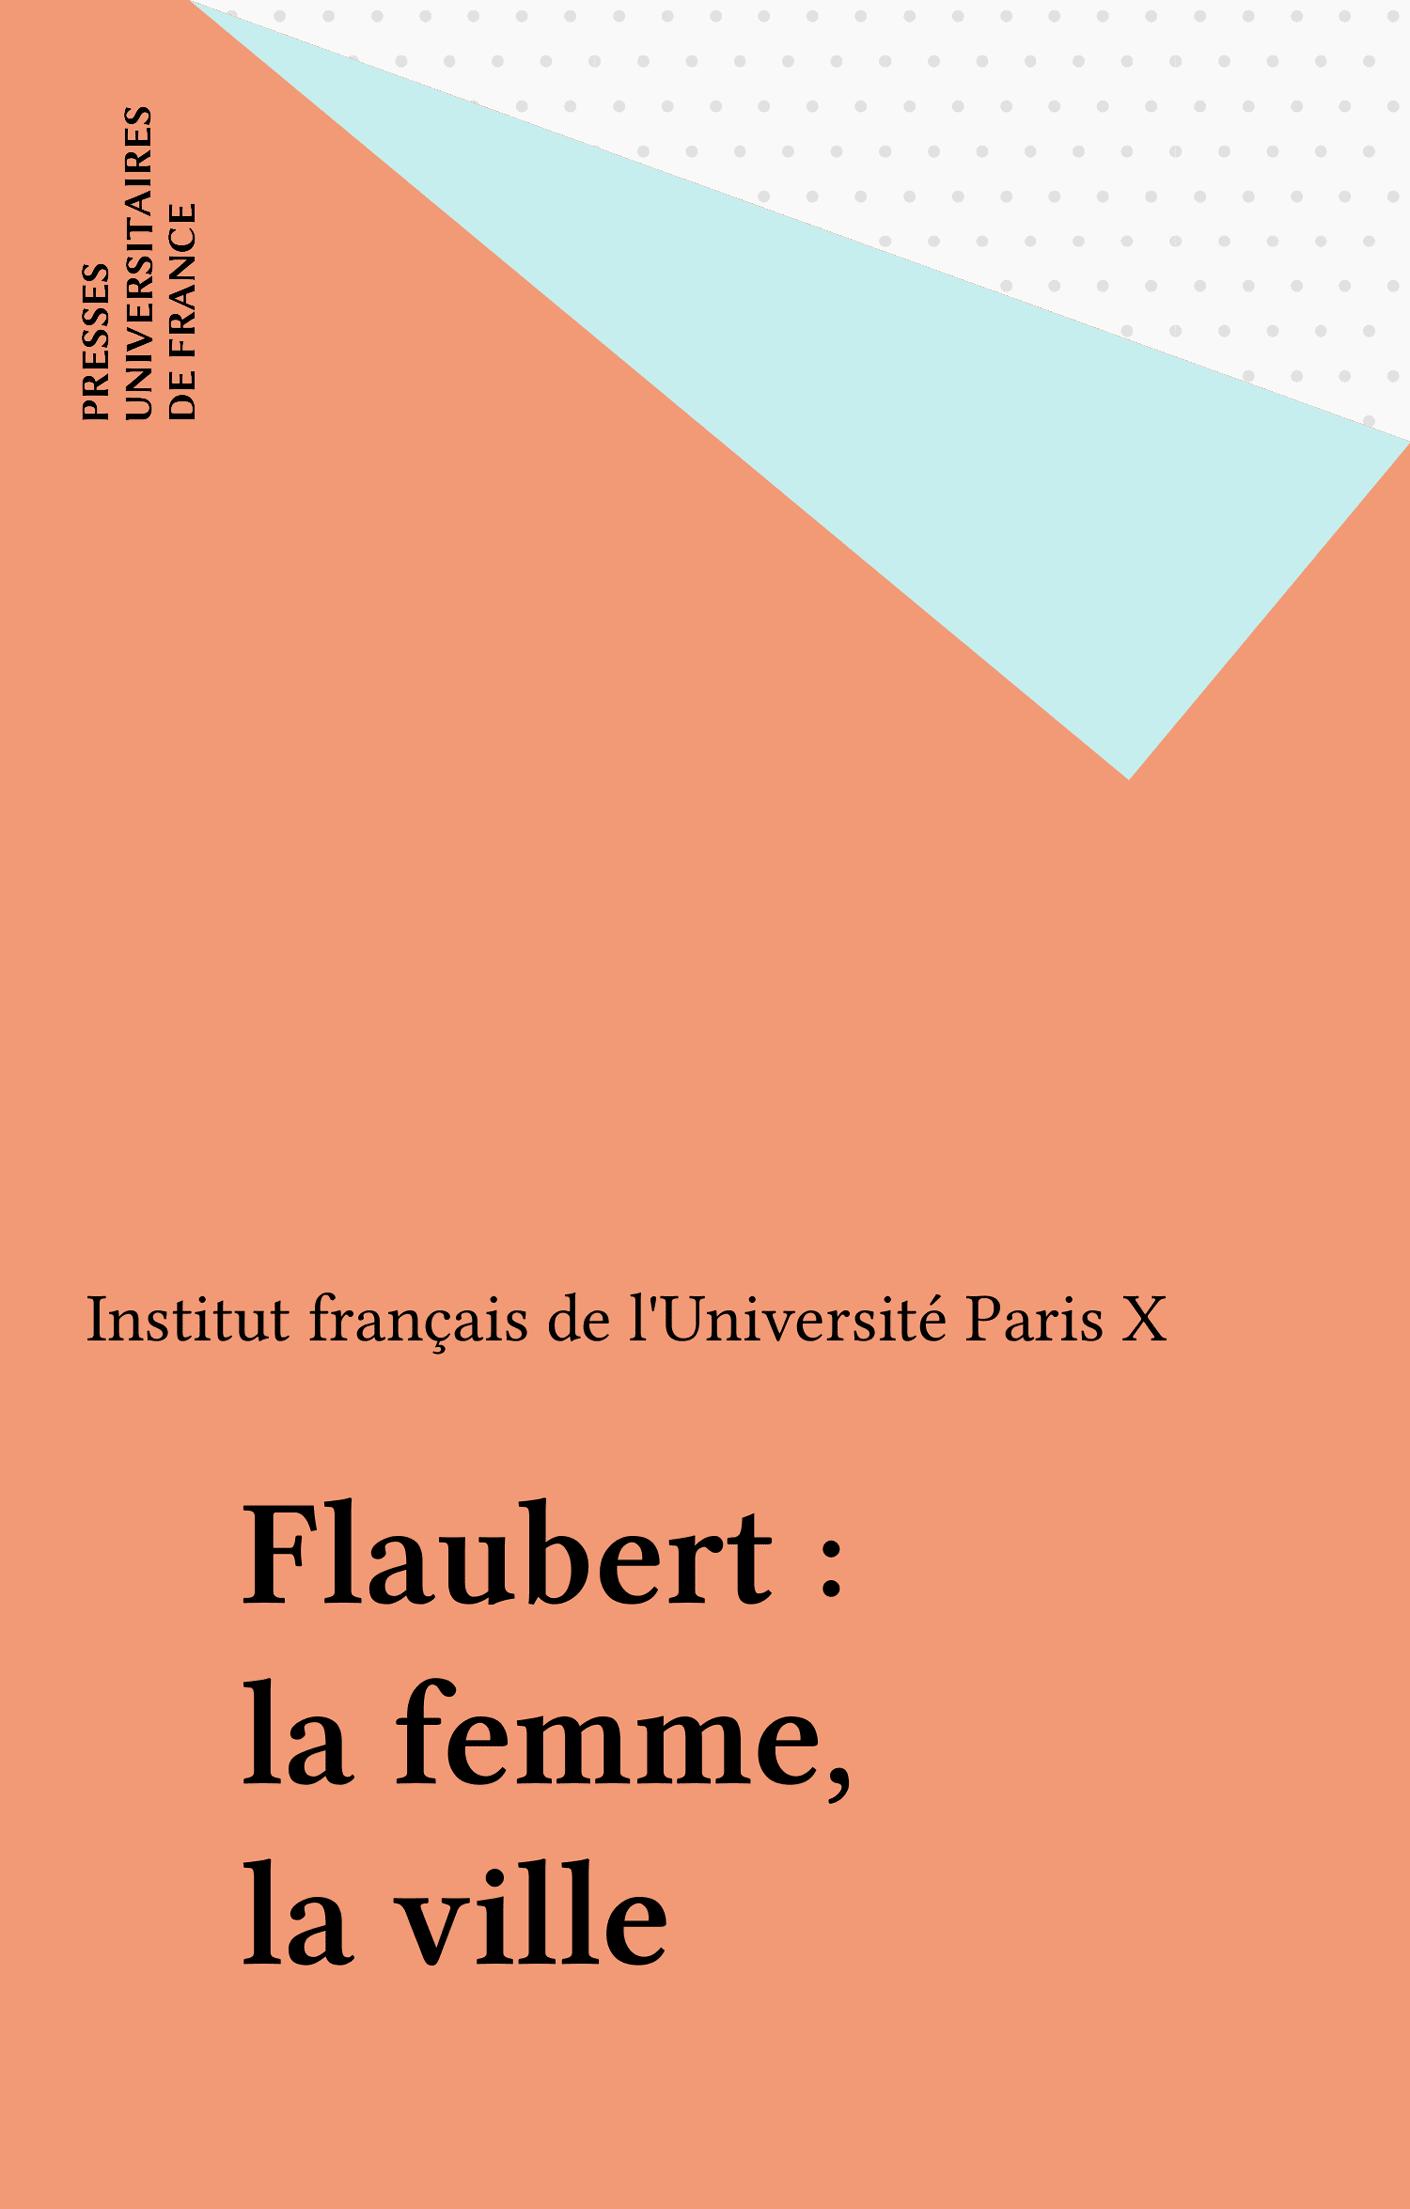 Flaubert : la femme, la ville